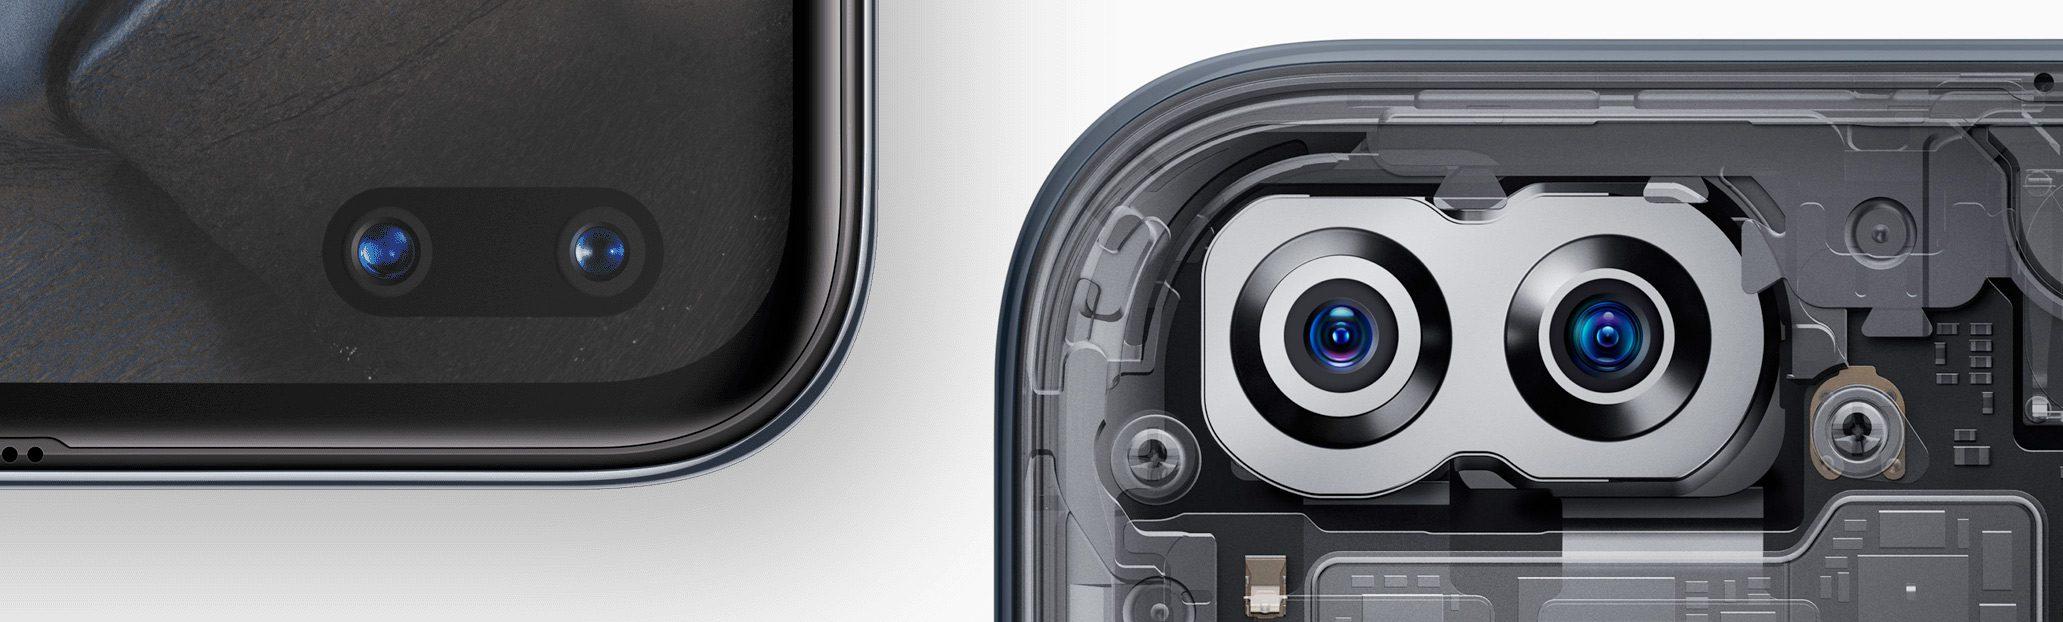 Comprar OnePlus Nord